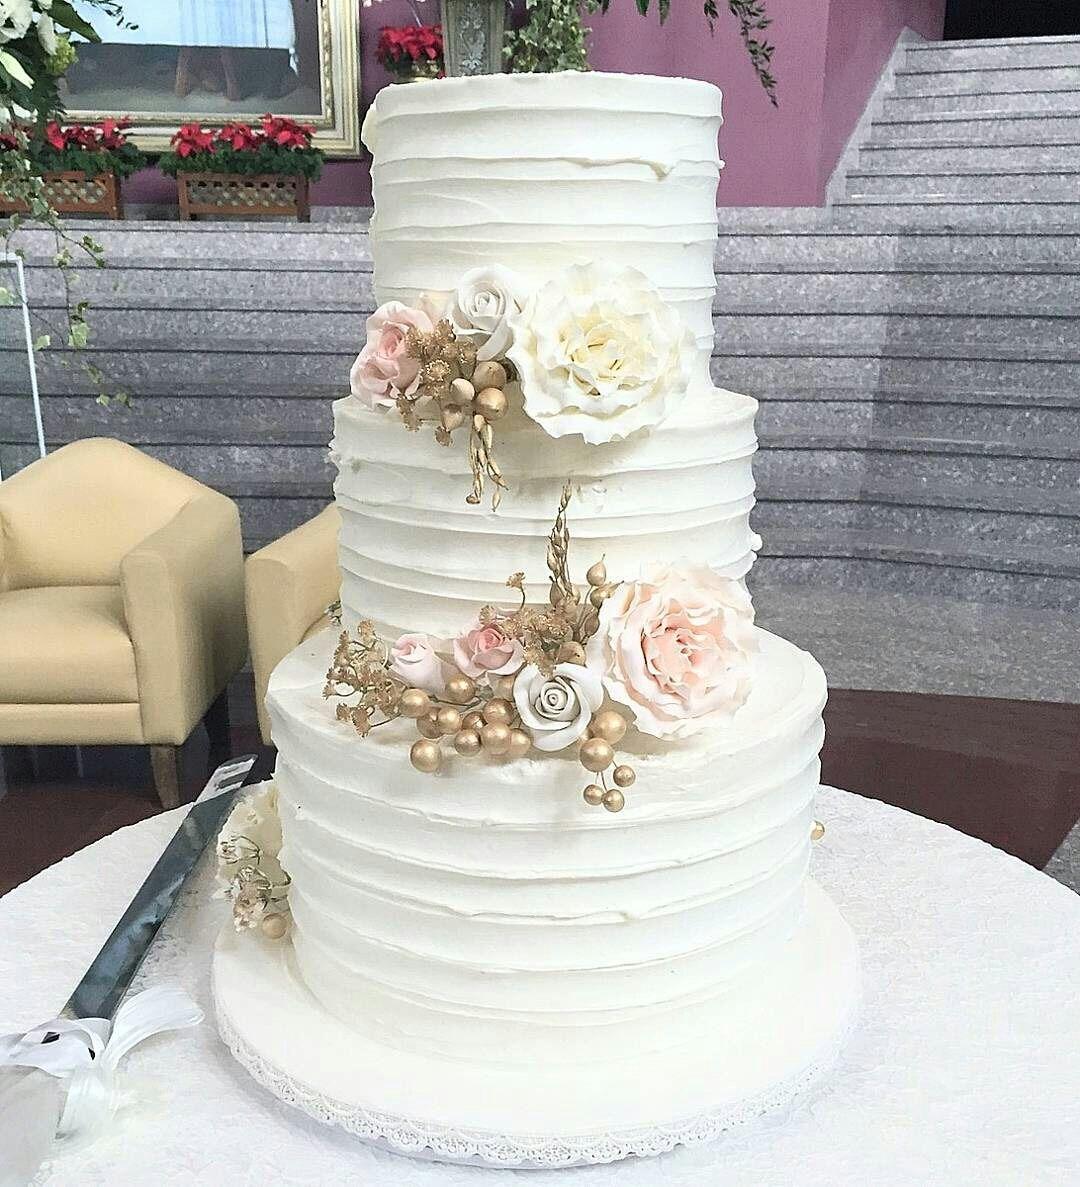 Funky Wedding Cakes Bali Vignette - Wedding Idea 2018 ...